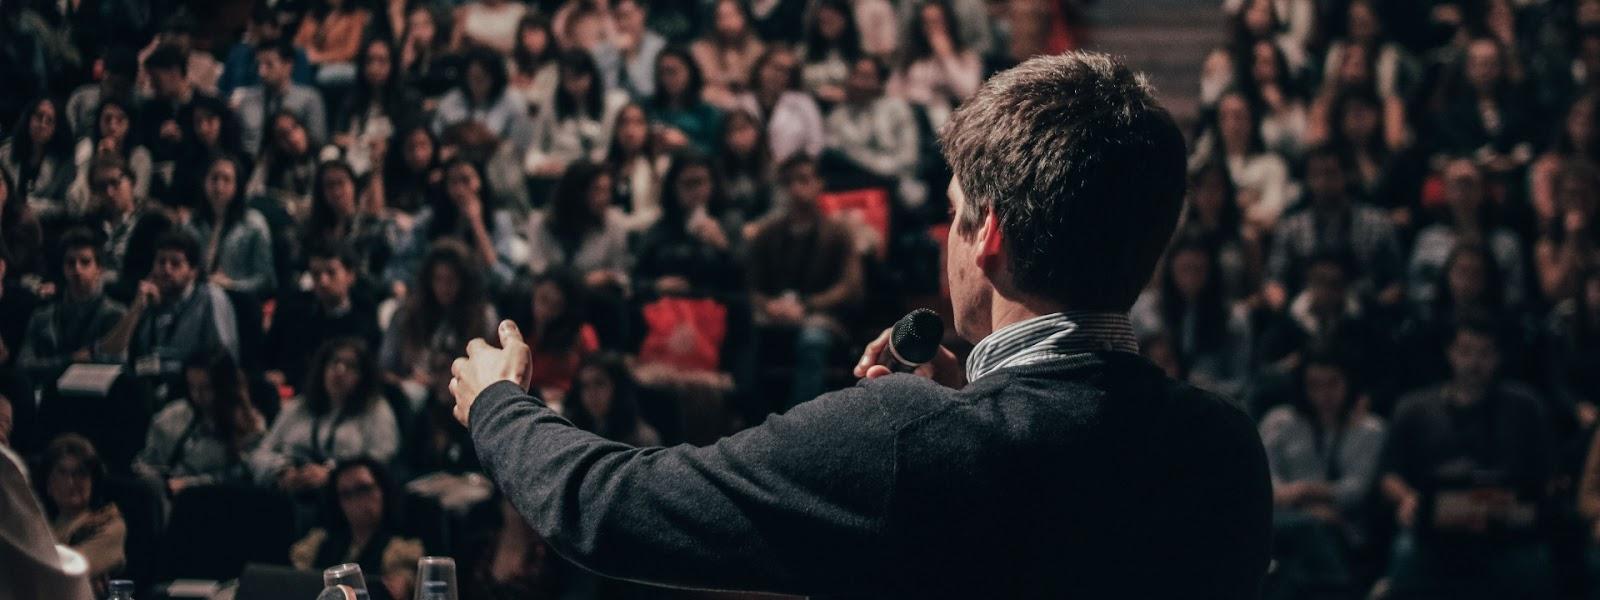 Intrapreneurs gain credibility faster than entrepreneurs